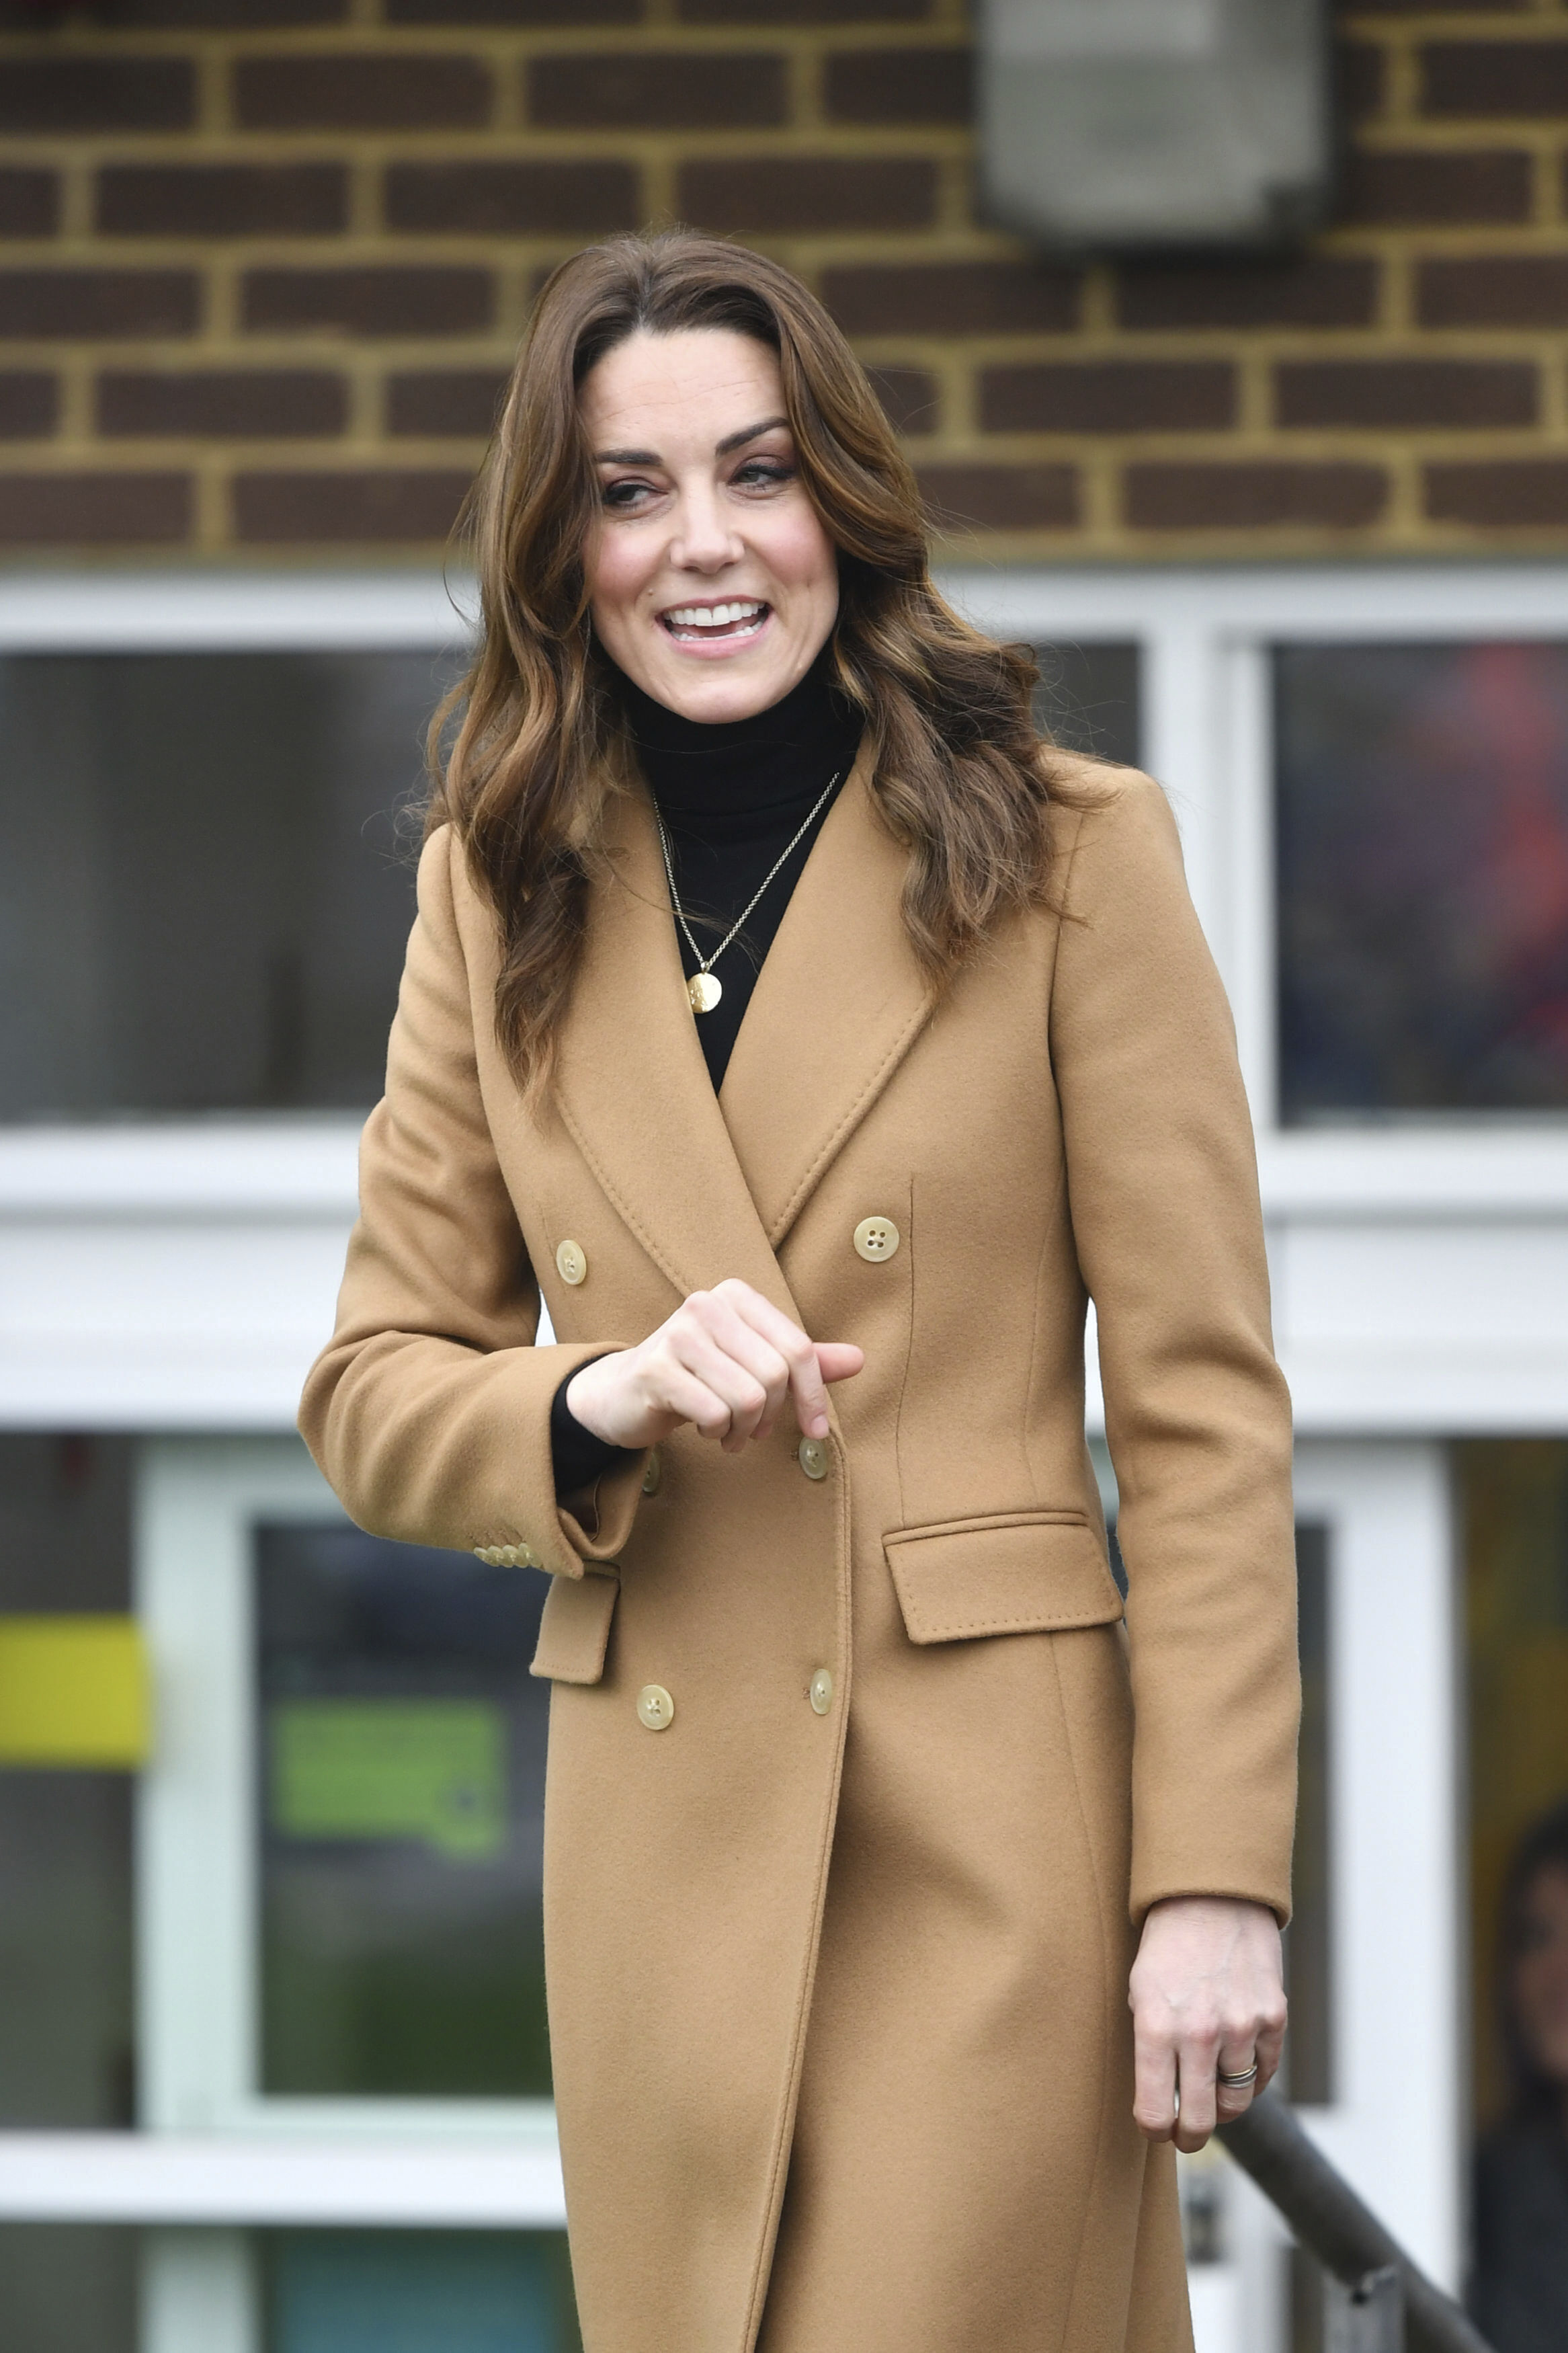 Bρήκαμε το παλτό της Kate Middleton με 40% έκπτωση